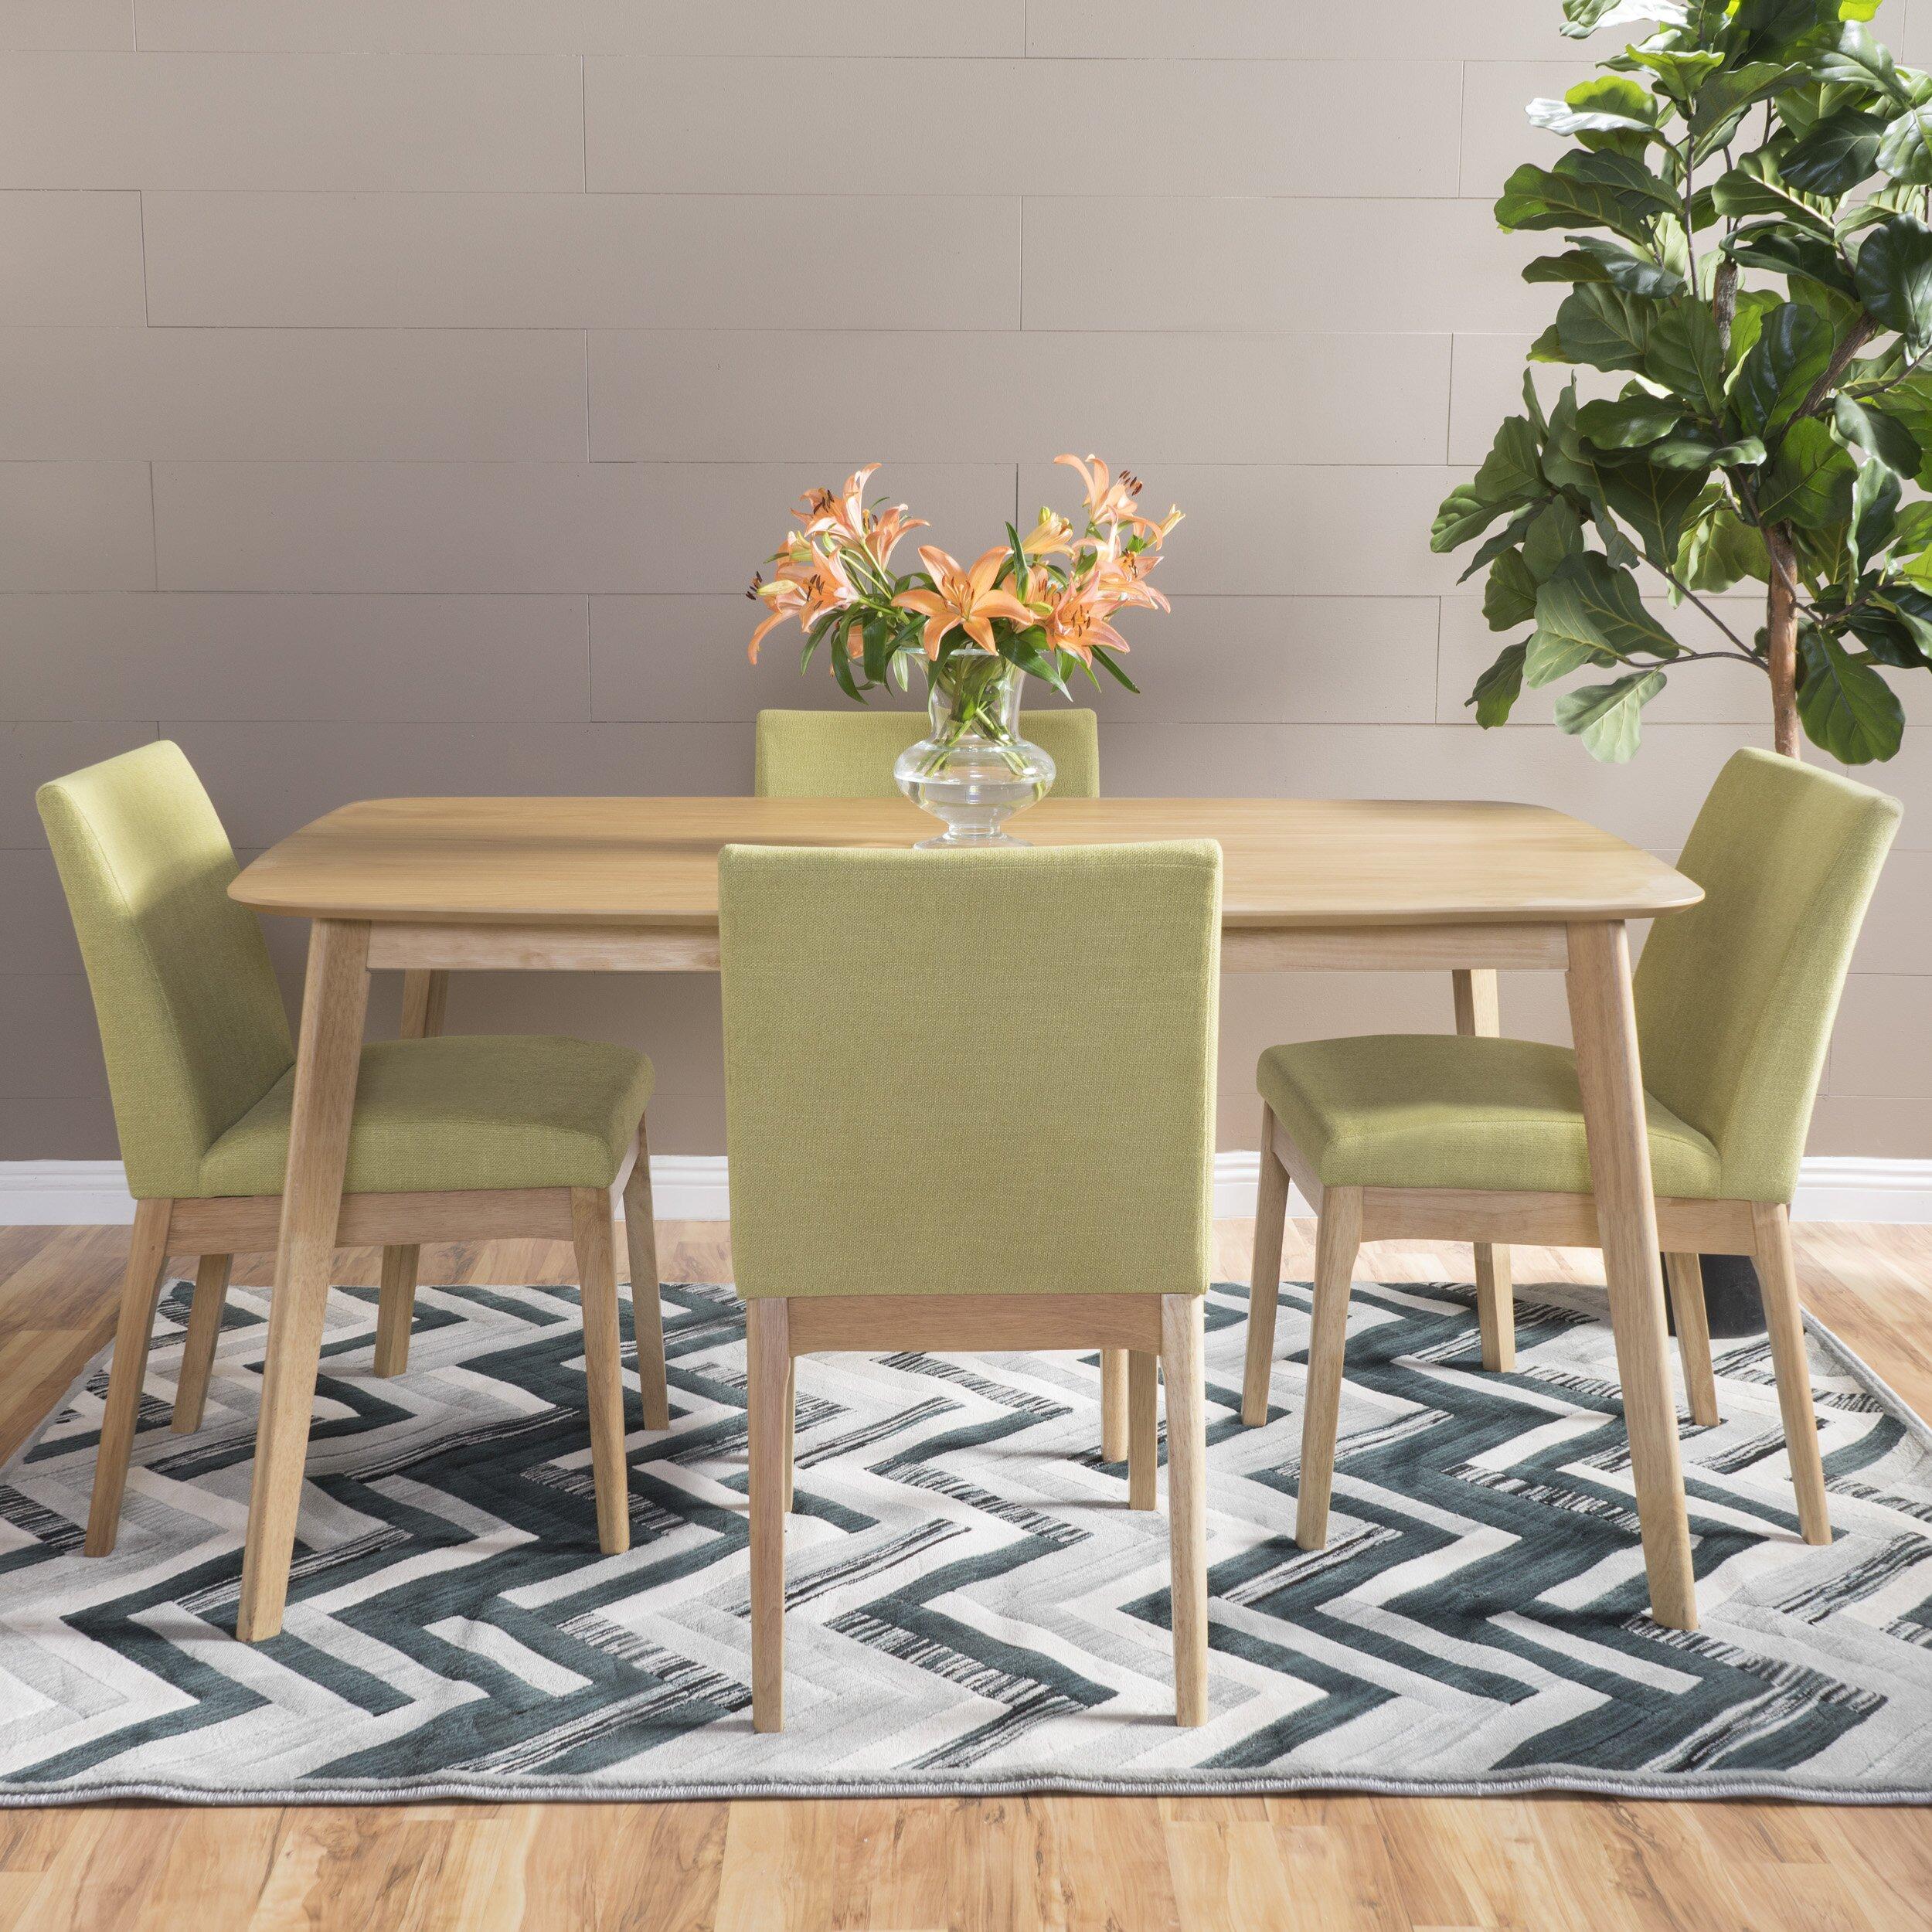 5 Piece Dining Room Sets Amazon Com: Langley Street Tunis 5 Piece Dining Set & Reviews